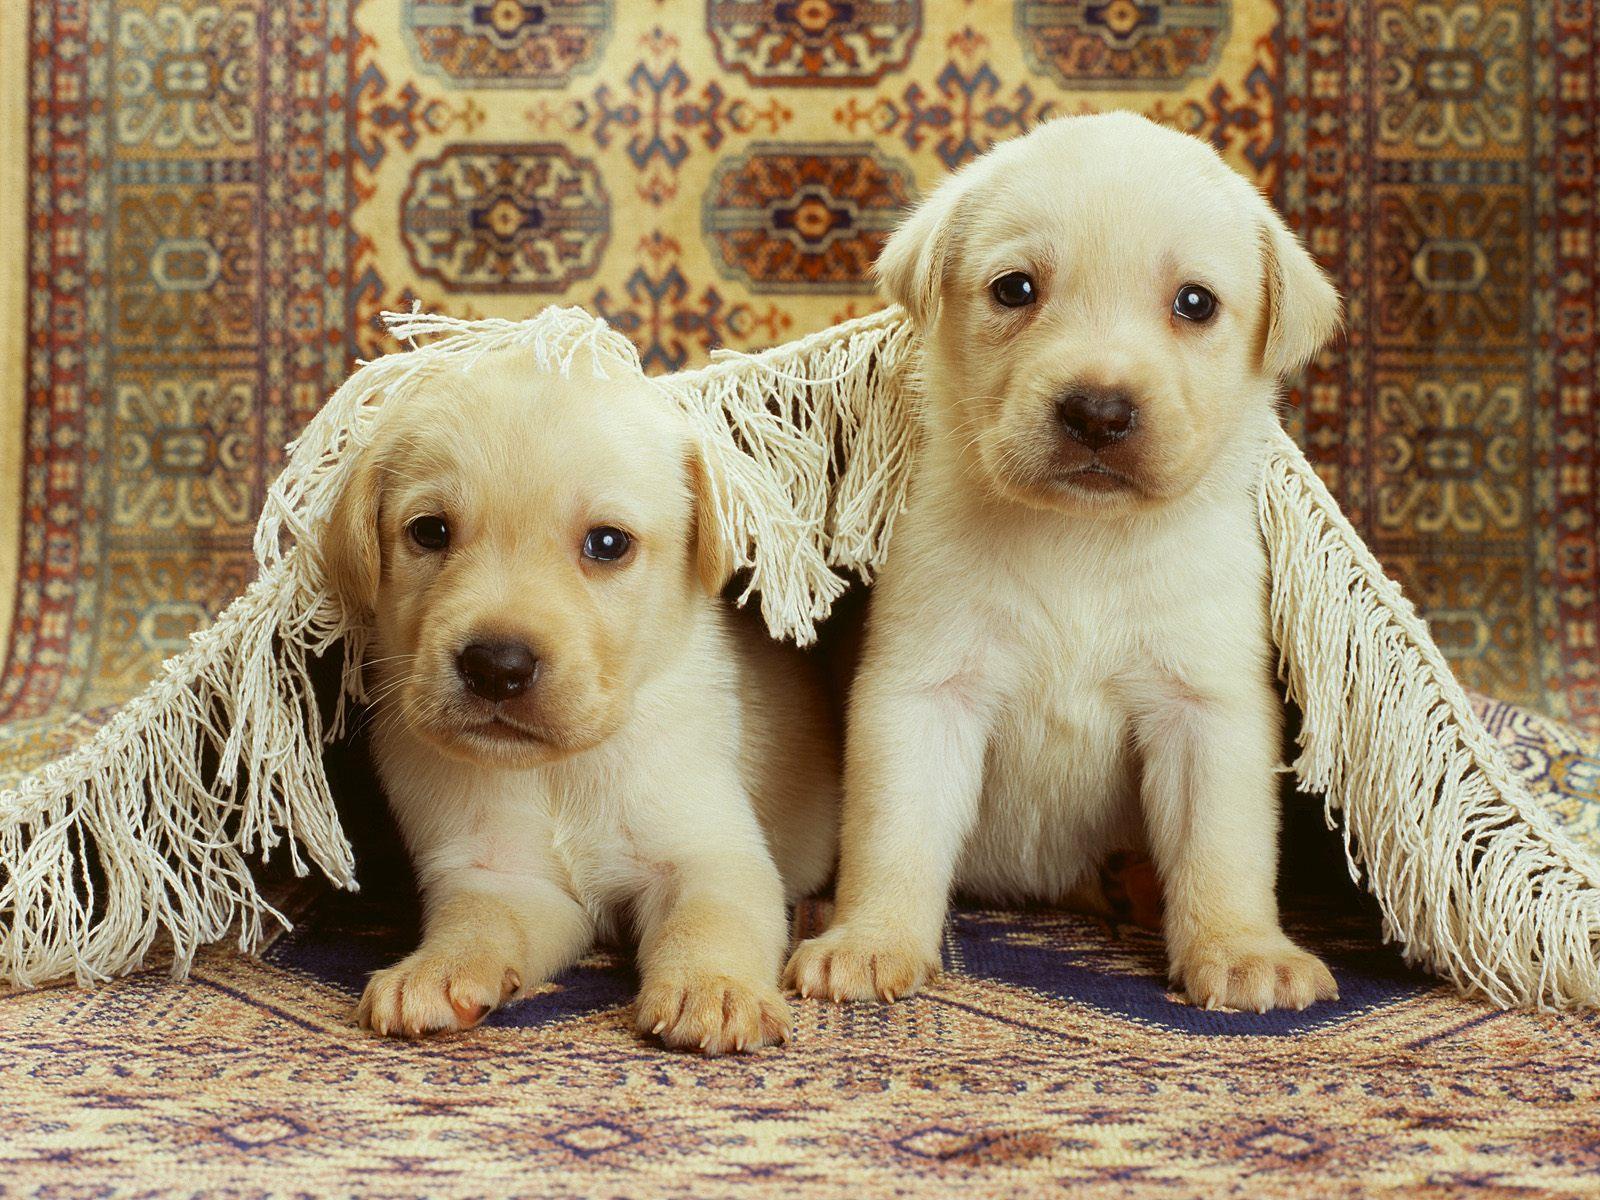 puppies wallpaper background